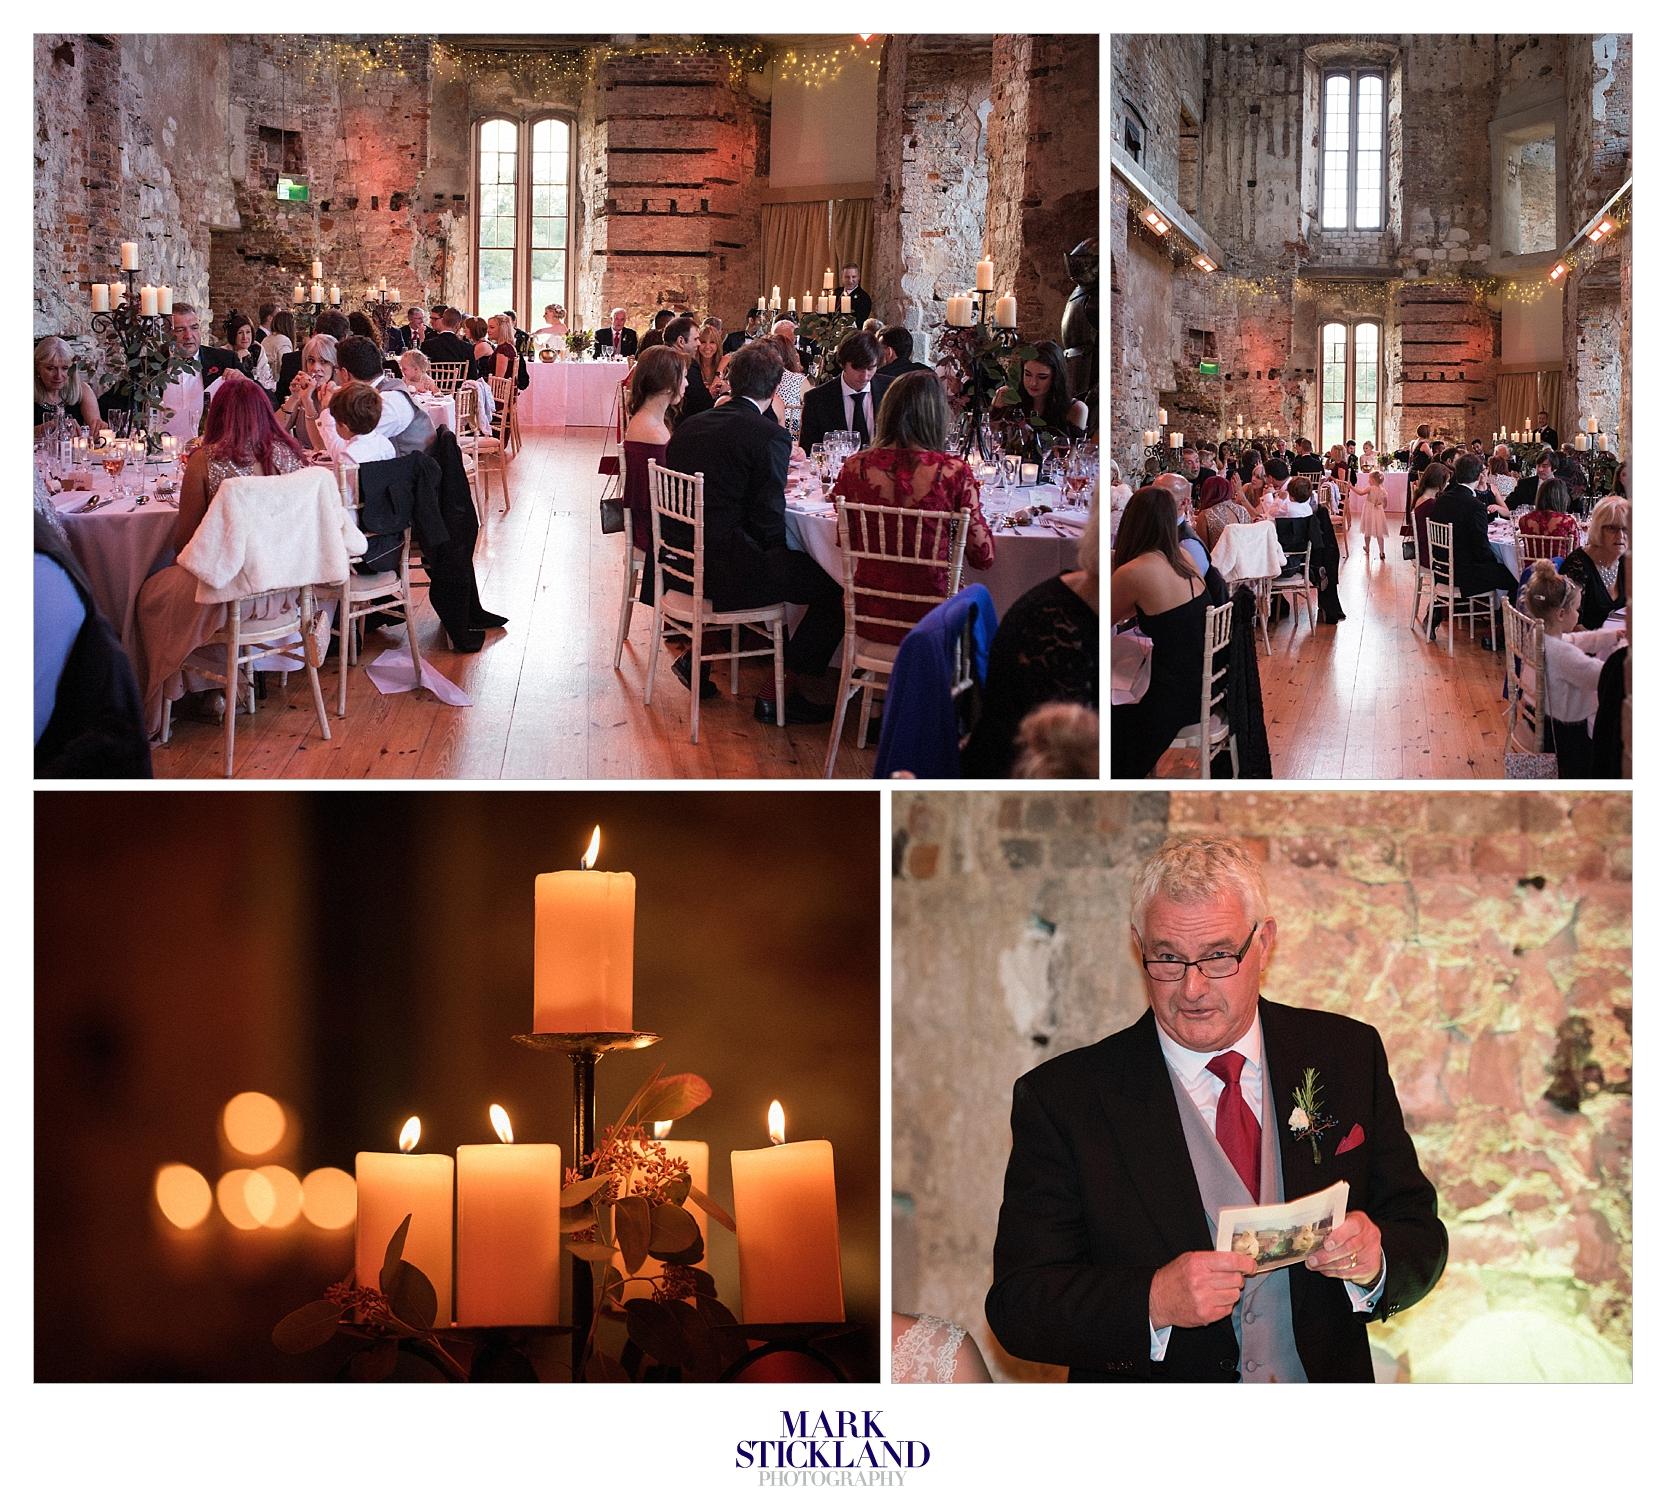 lulworth_castle_wedding_dorset_mark stickland photography.31